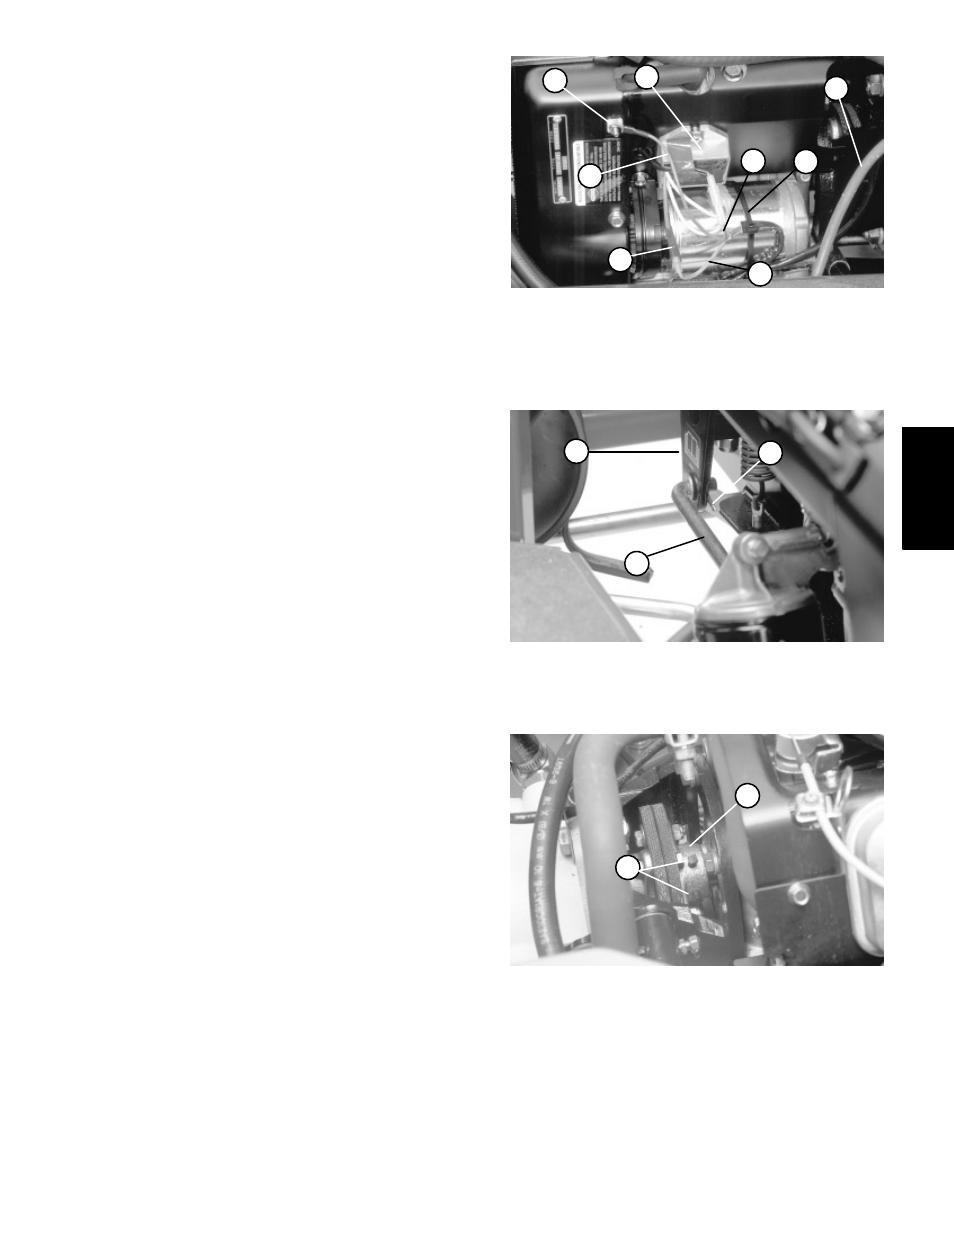 hight resolution of toro sand pro 5020 user manual page 43 170 original modetoro sand pro 5020 user manual